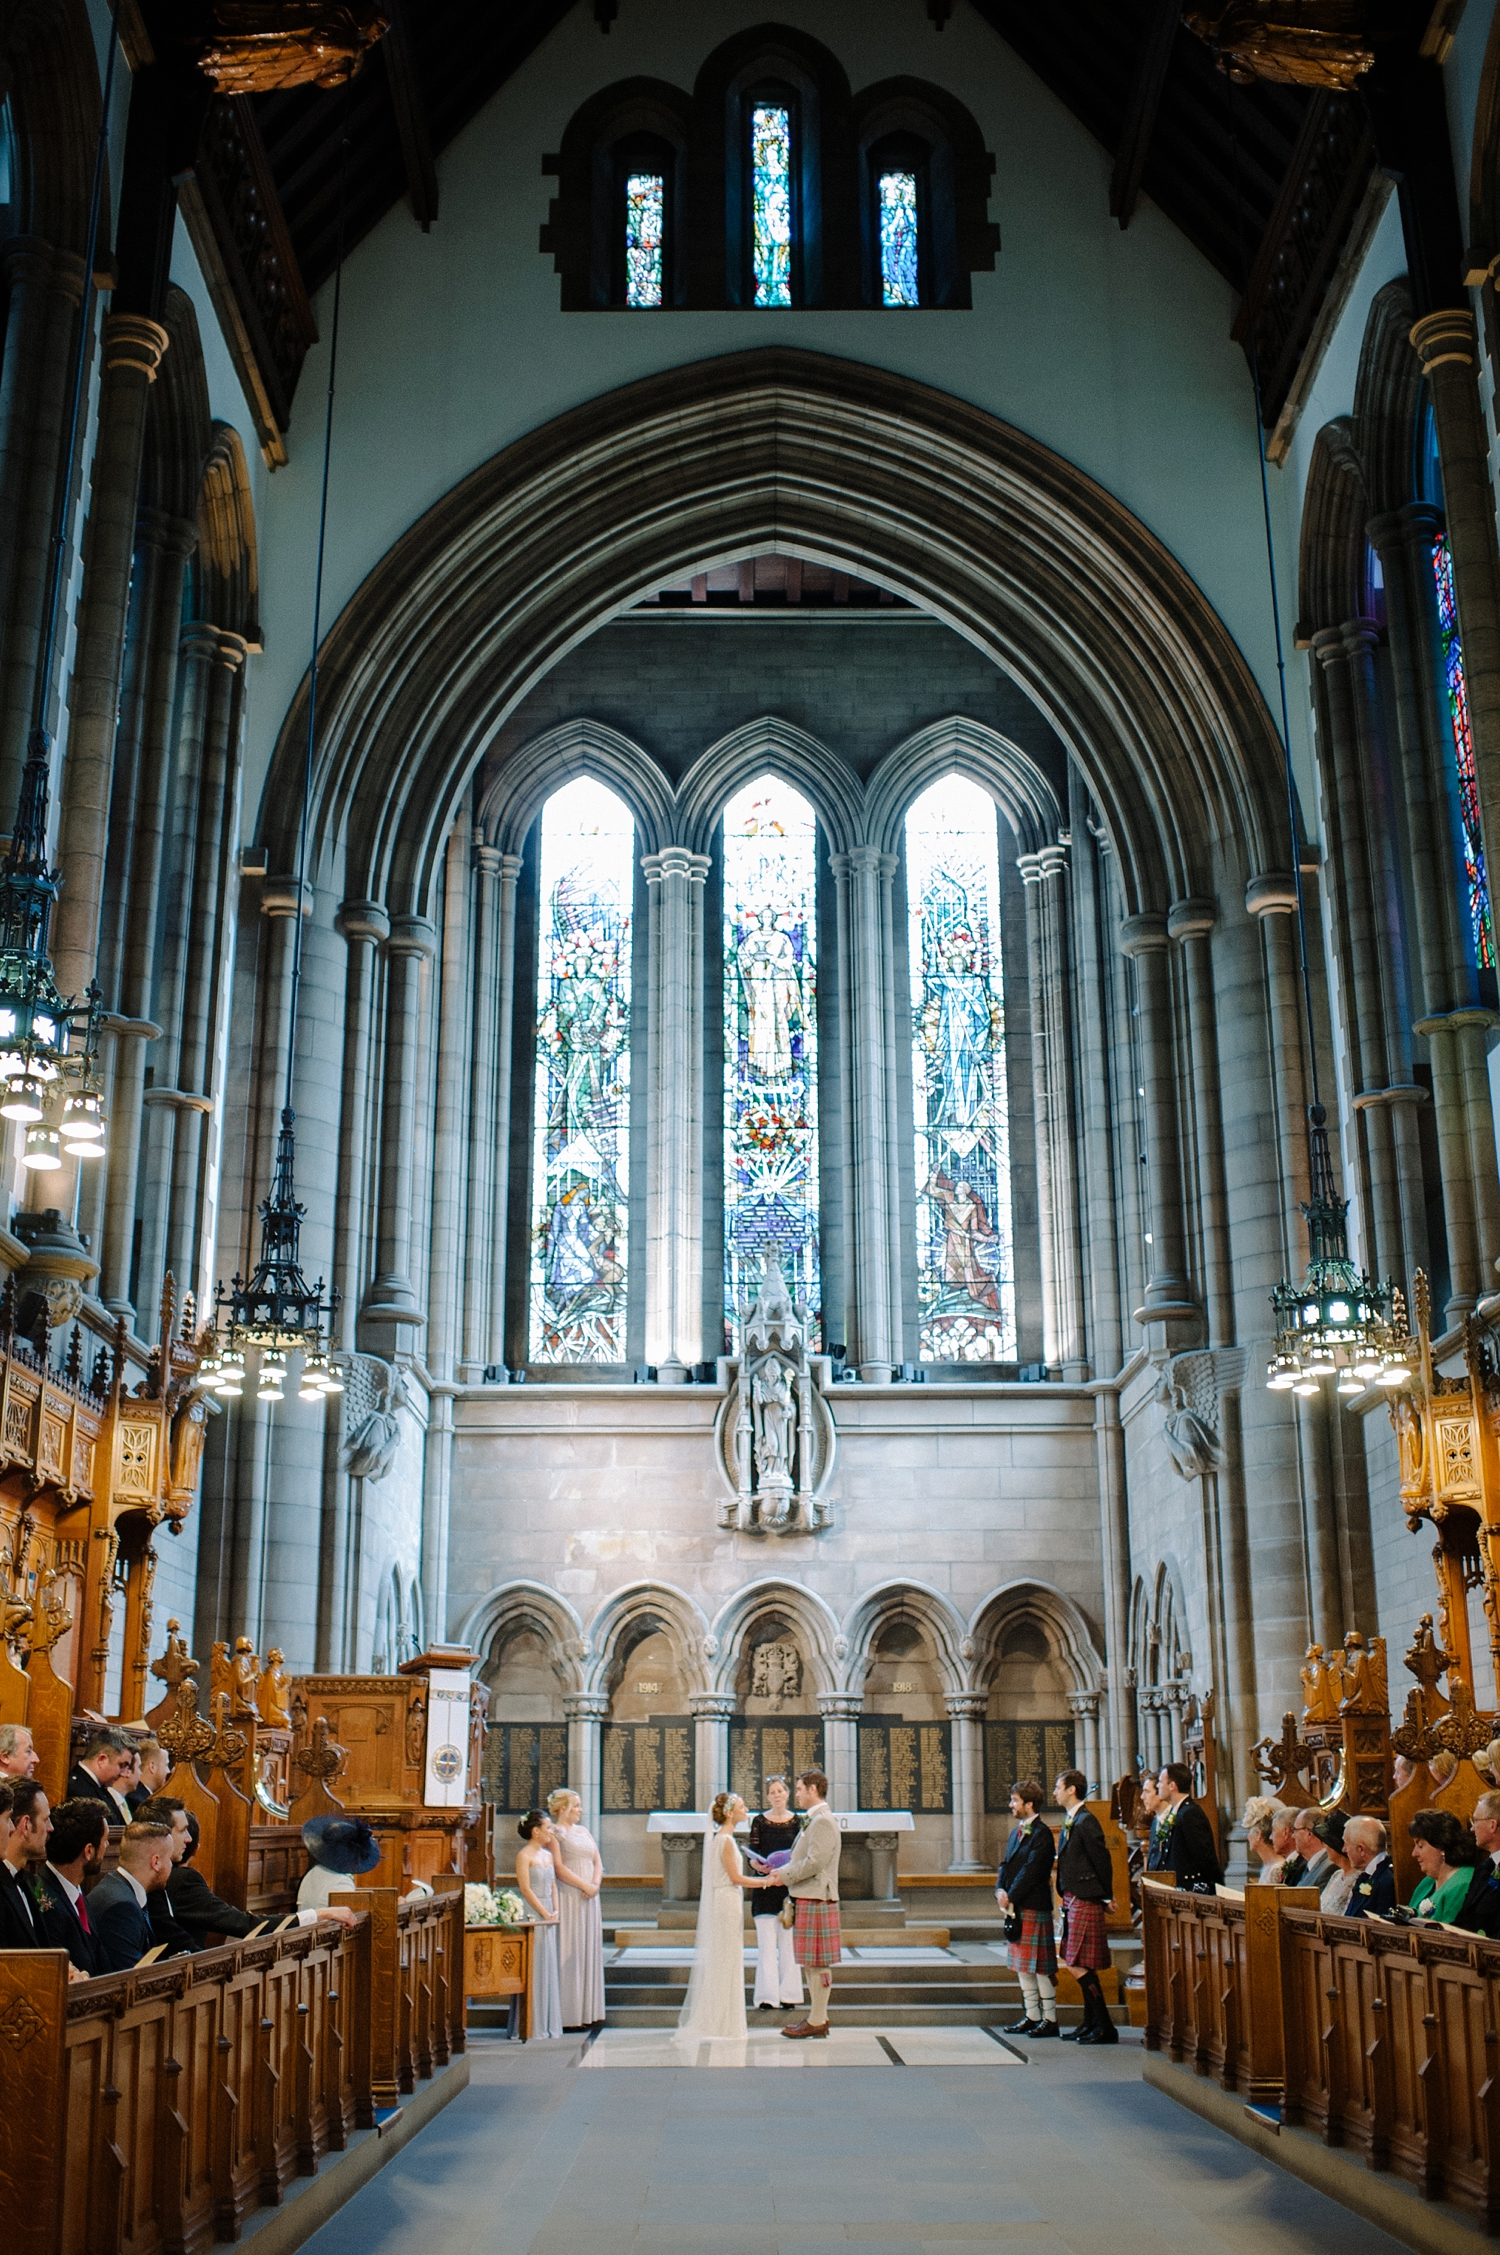 027-lisa-devine-photography-alternative-creative-wedding-photography-glasgow-scotland-uk.JPG